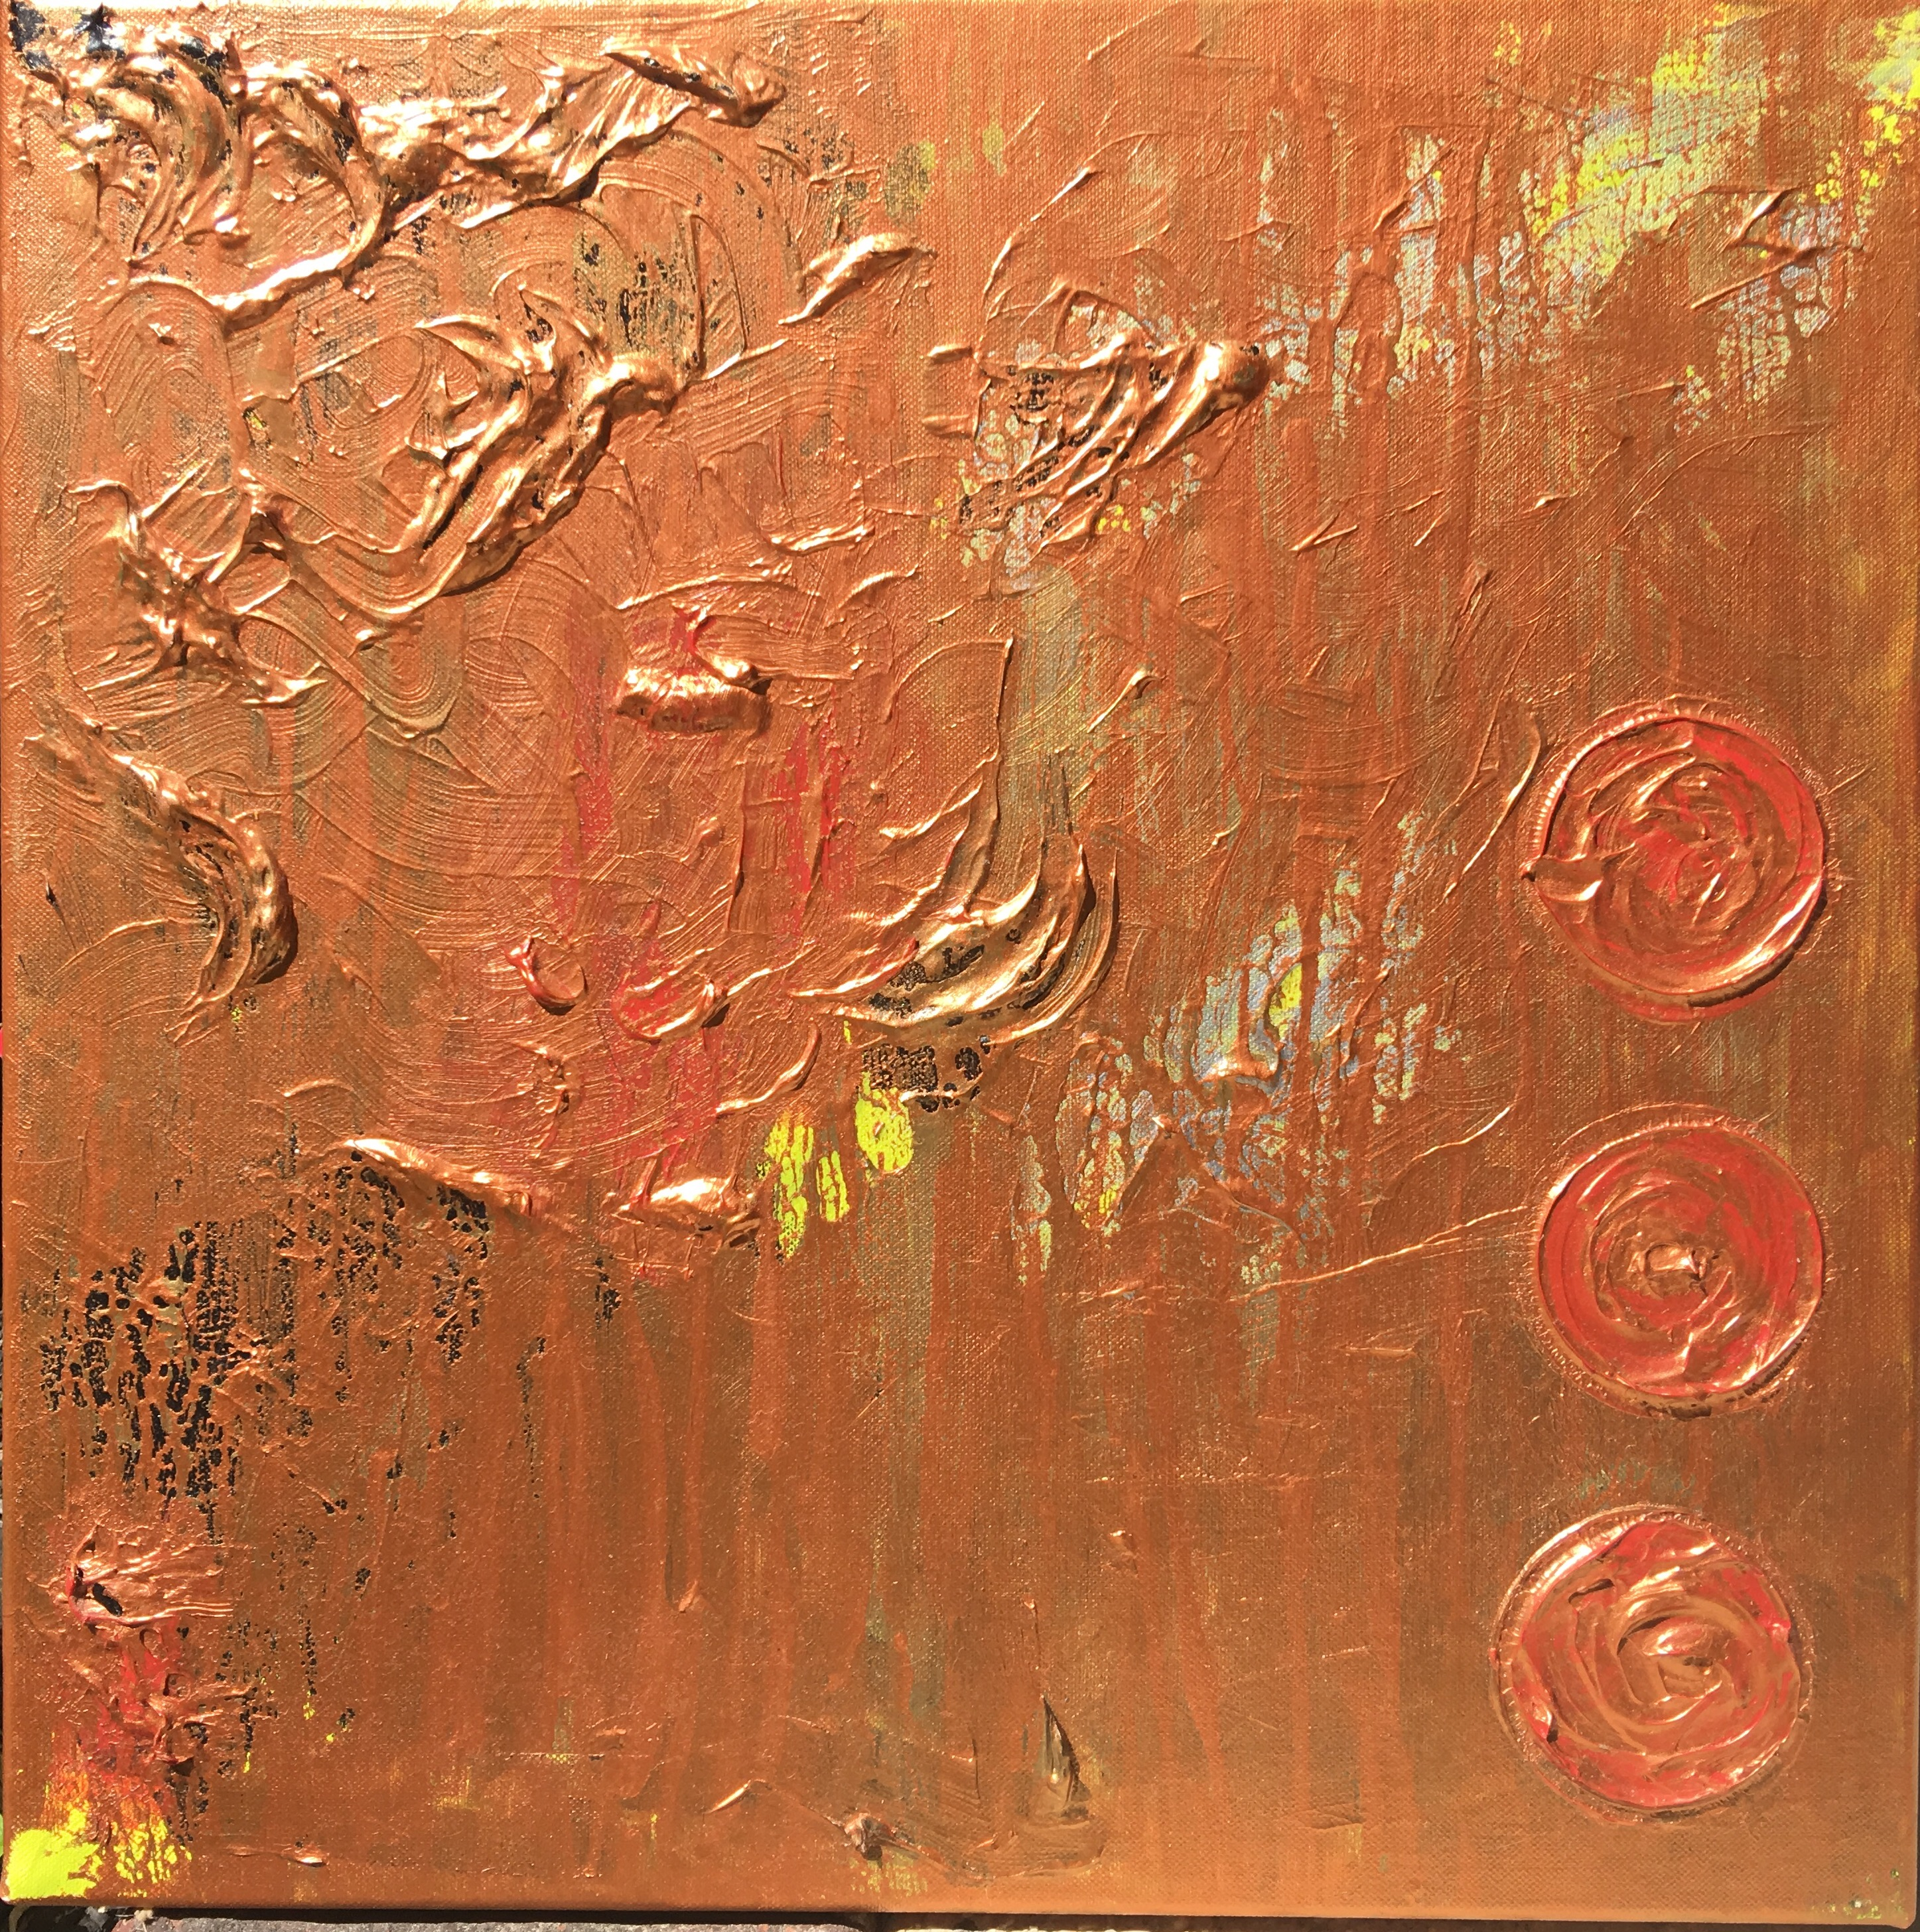 Copper by Toni Poe